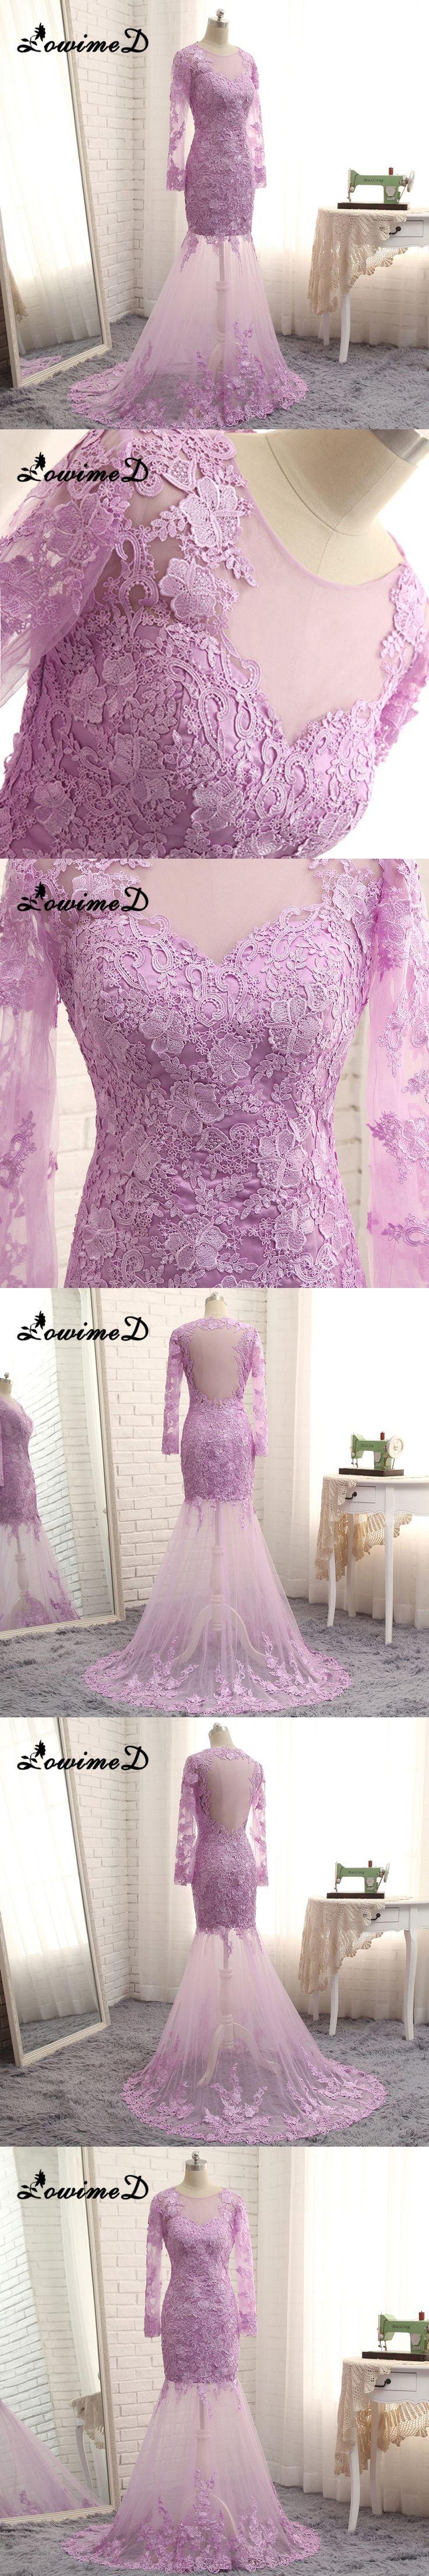 2017 Real Pics Elegant Mermaid Evening Dress Hot Floor Length Sheer Neck Appliques Wedding Party Dress Robe De Soiree Custom